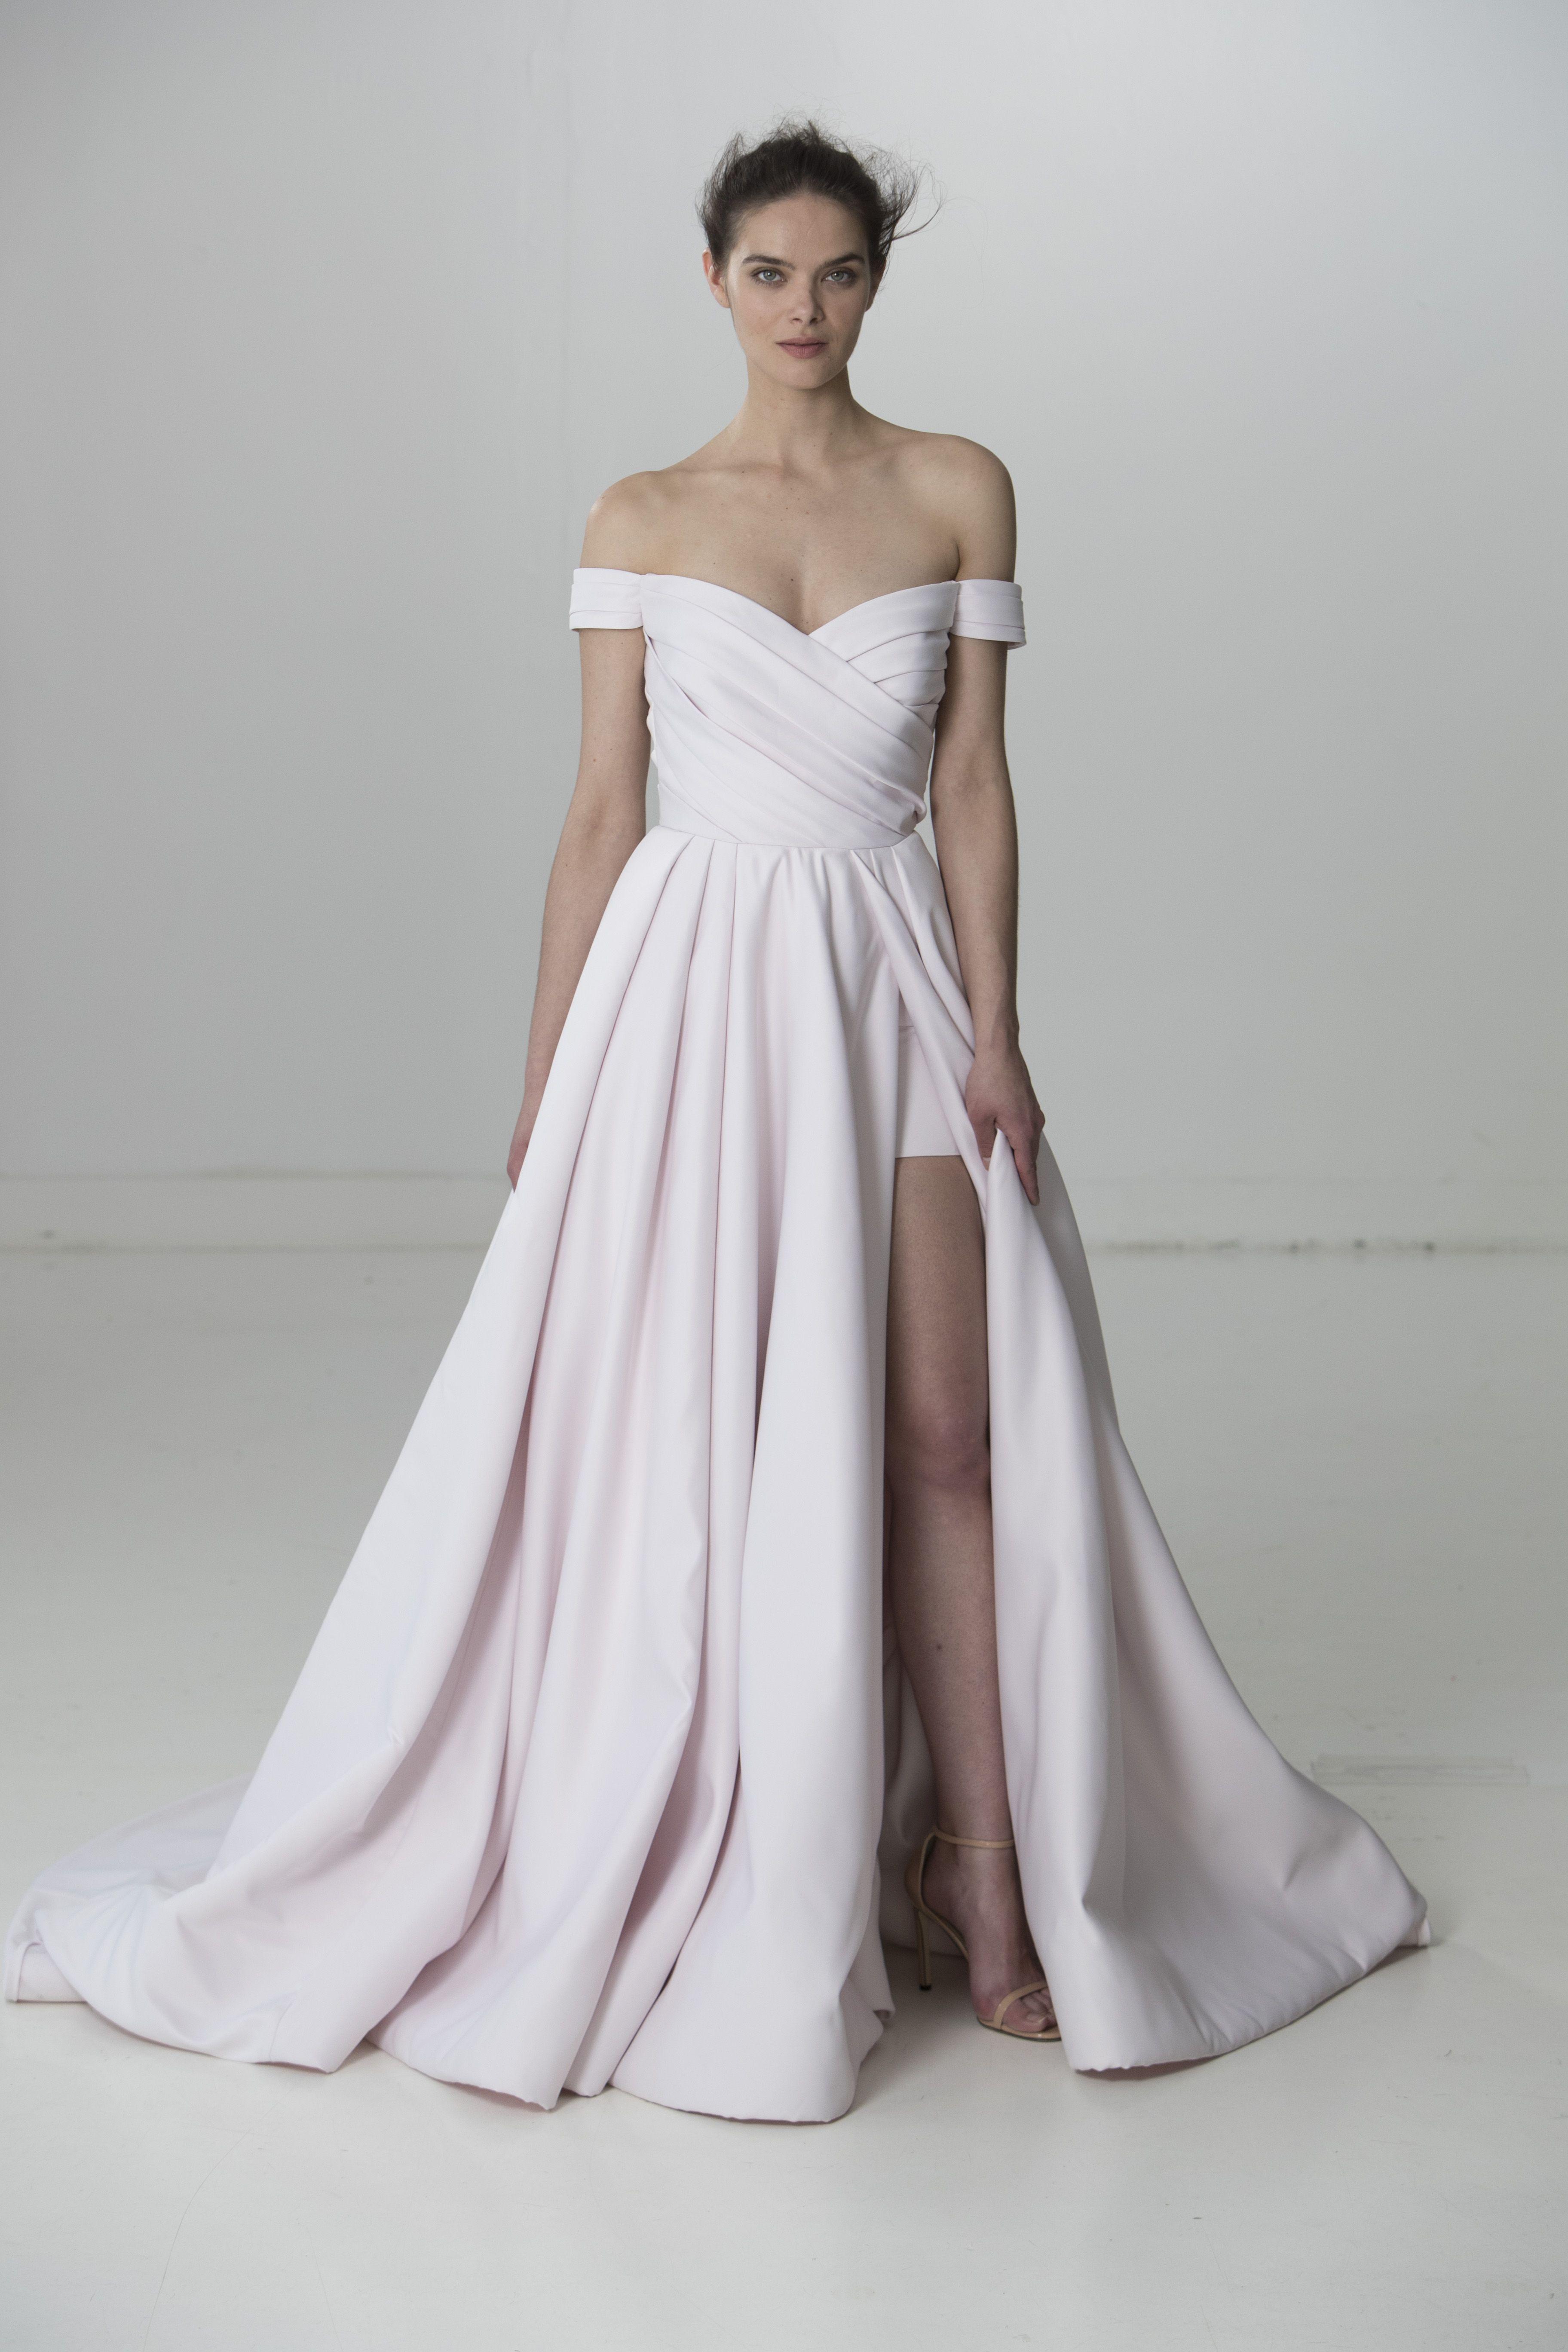 2468a25696b78 Brilliant - Alyne Spring 2018 Bridal Dresses, Wedding Gowns, Bridesmaid  Dresses, Prom Dresses